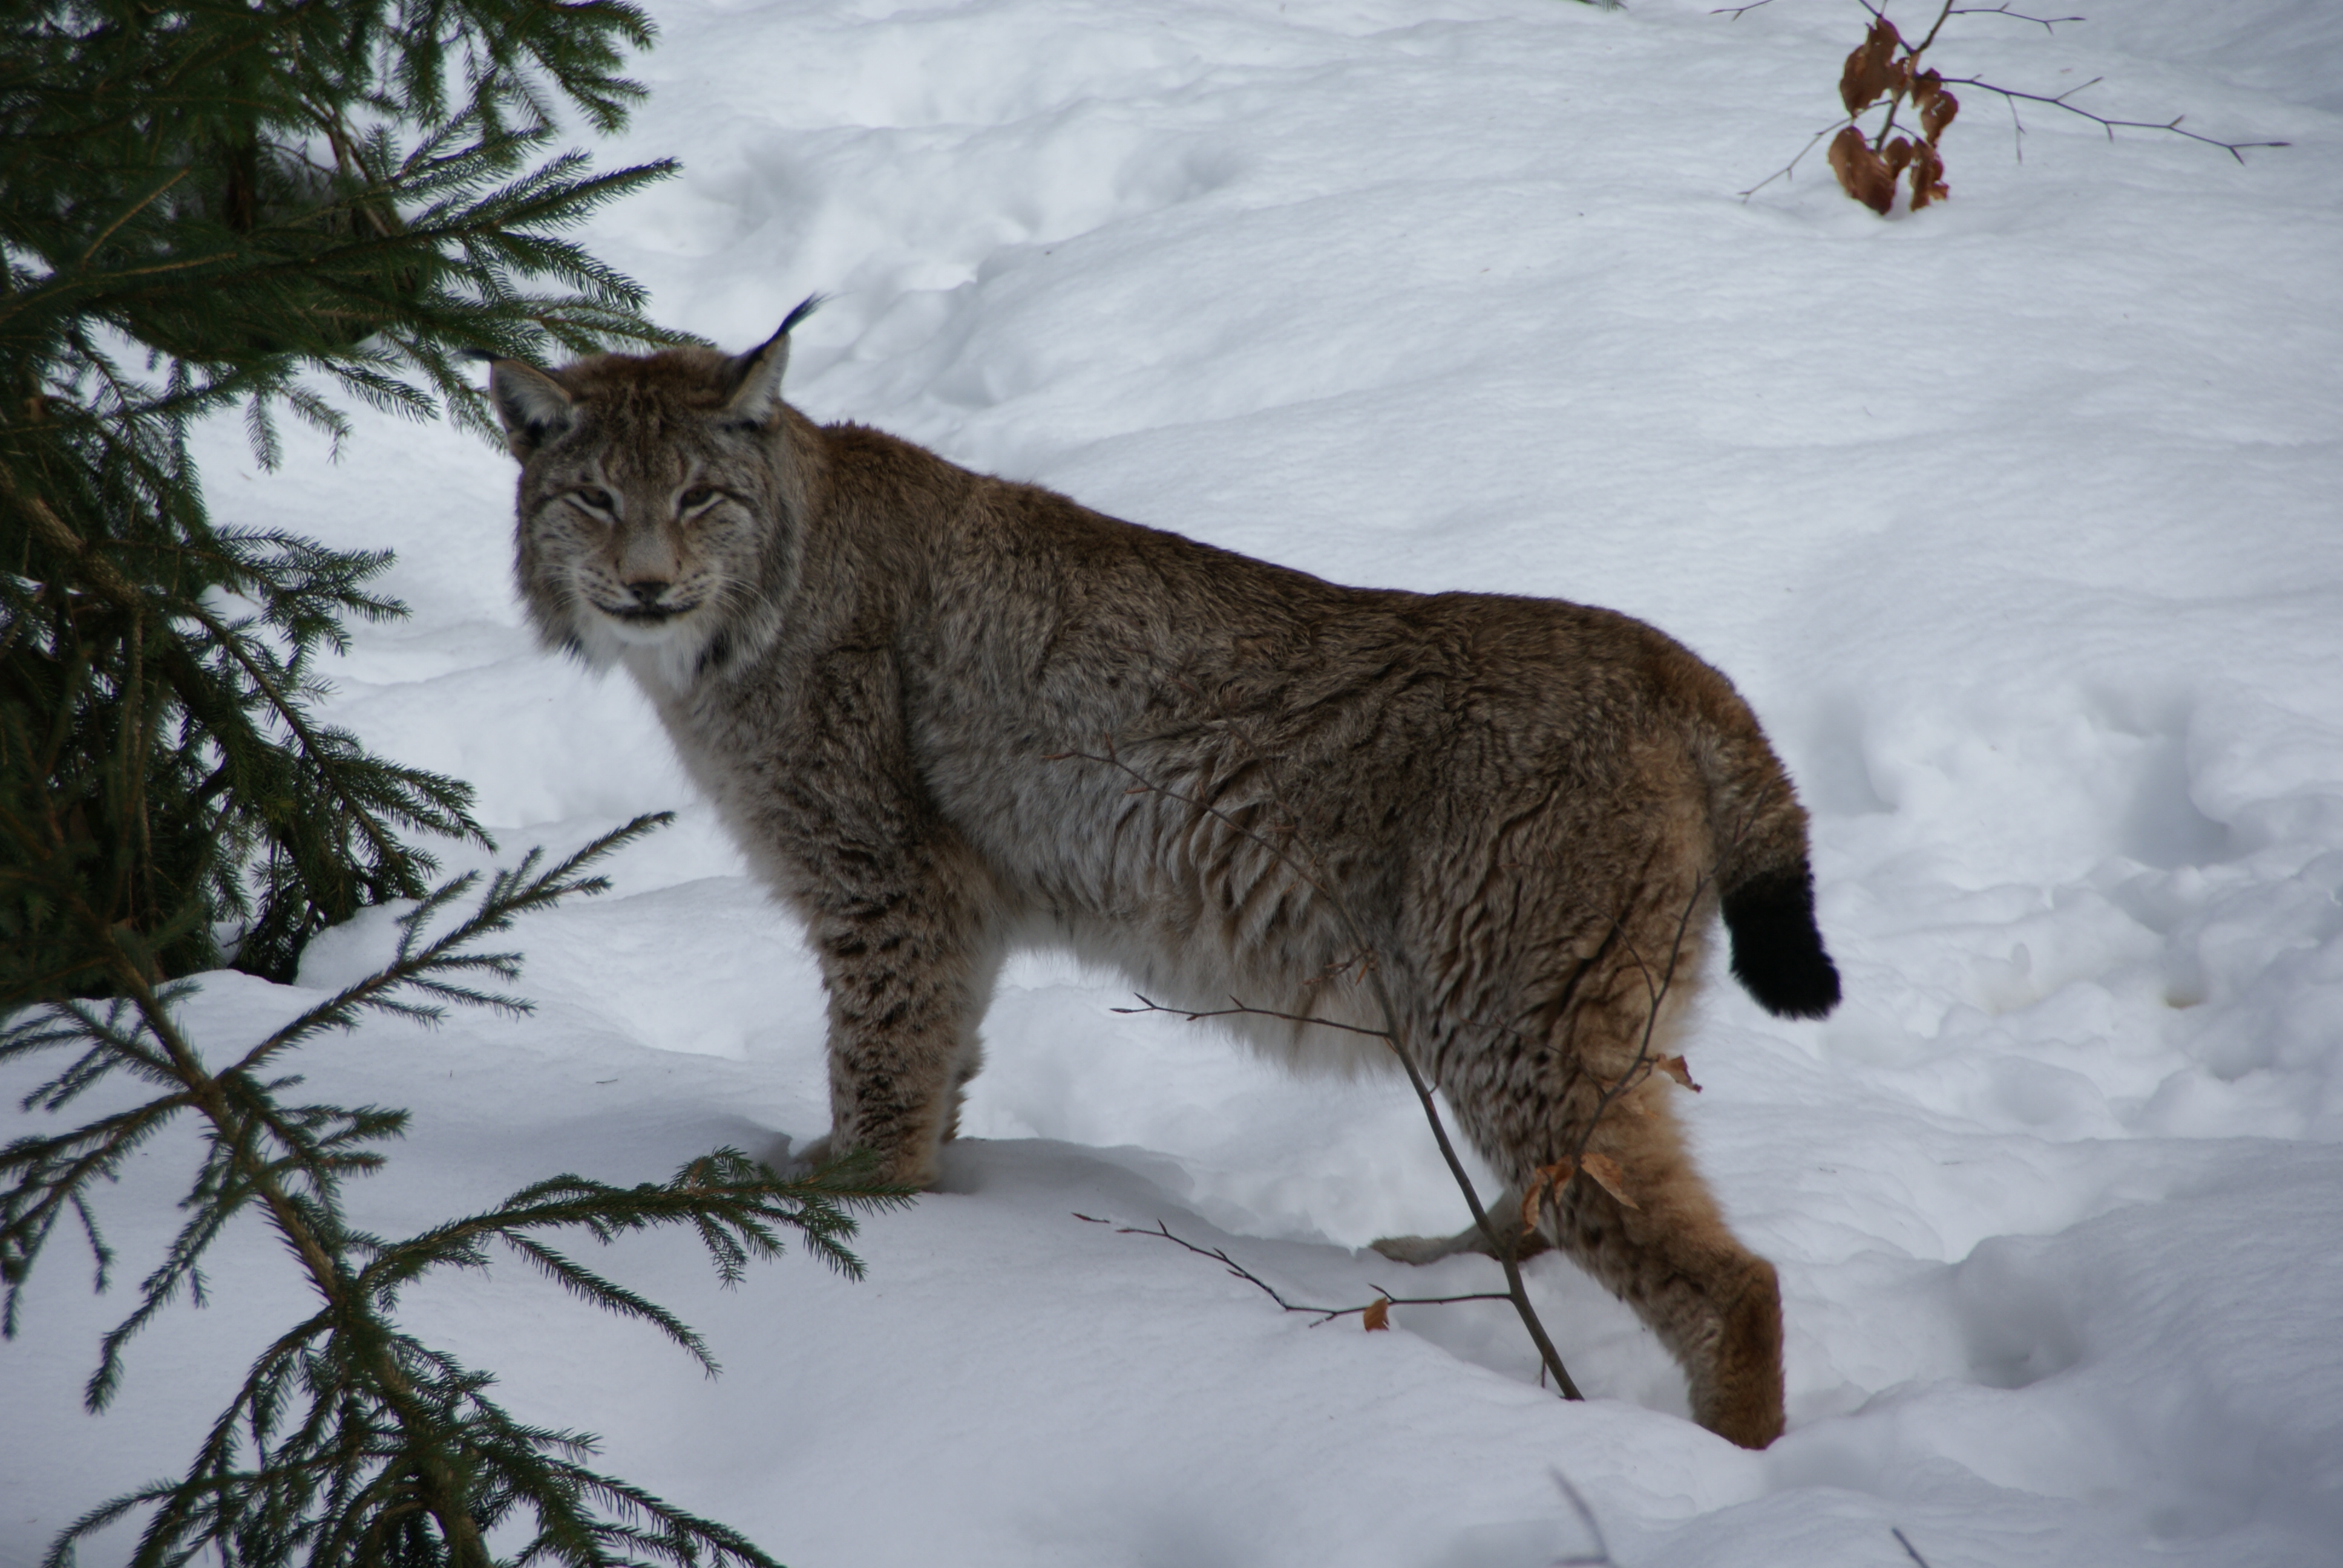 File:Lynx Nationalpark Bayerischer Wald 01.jpg - Wikimedia Commons